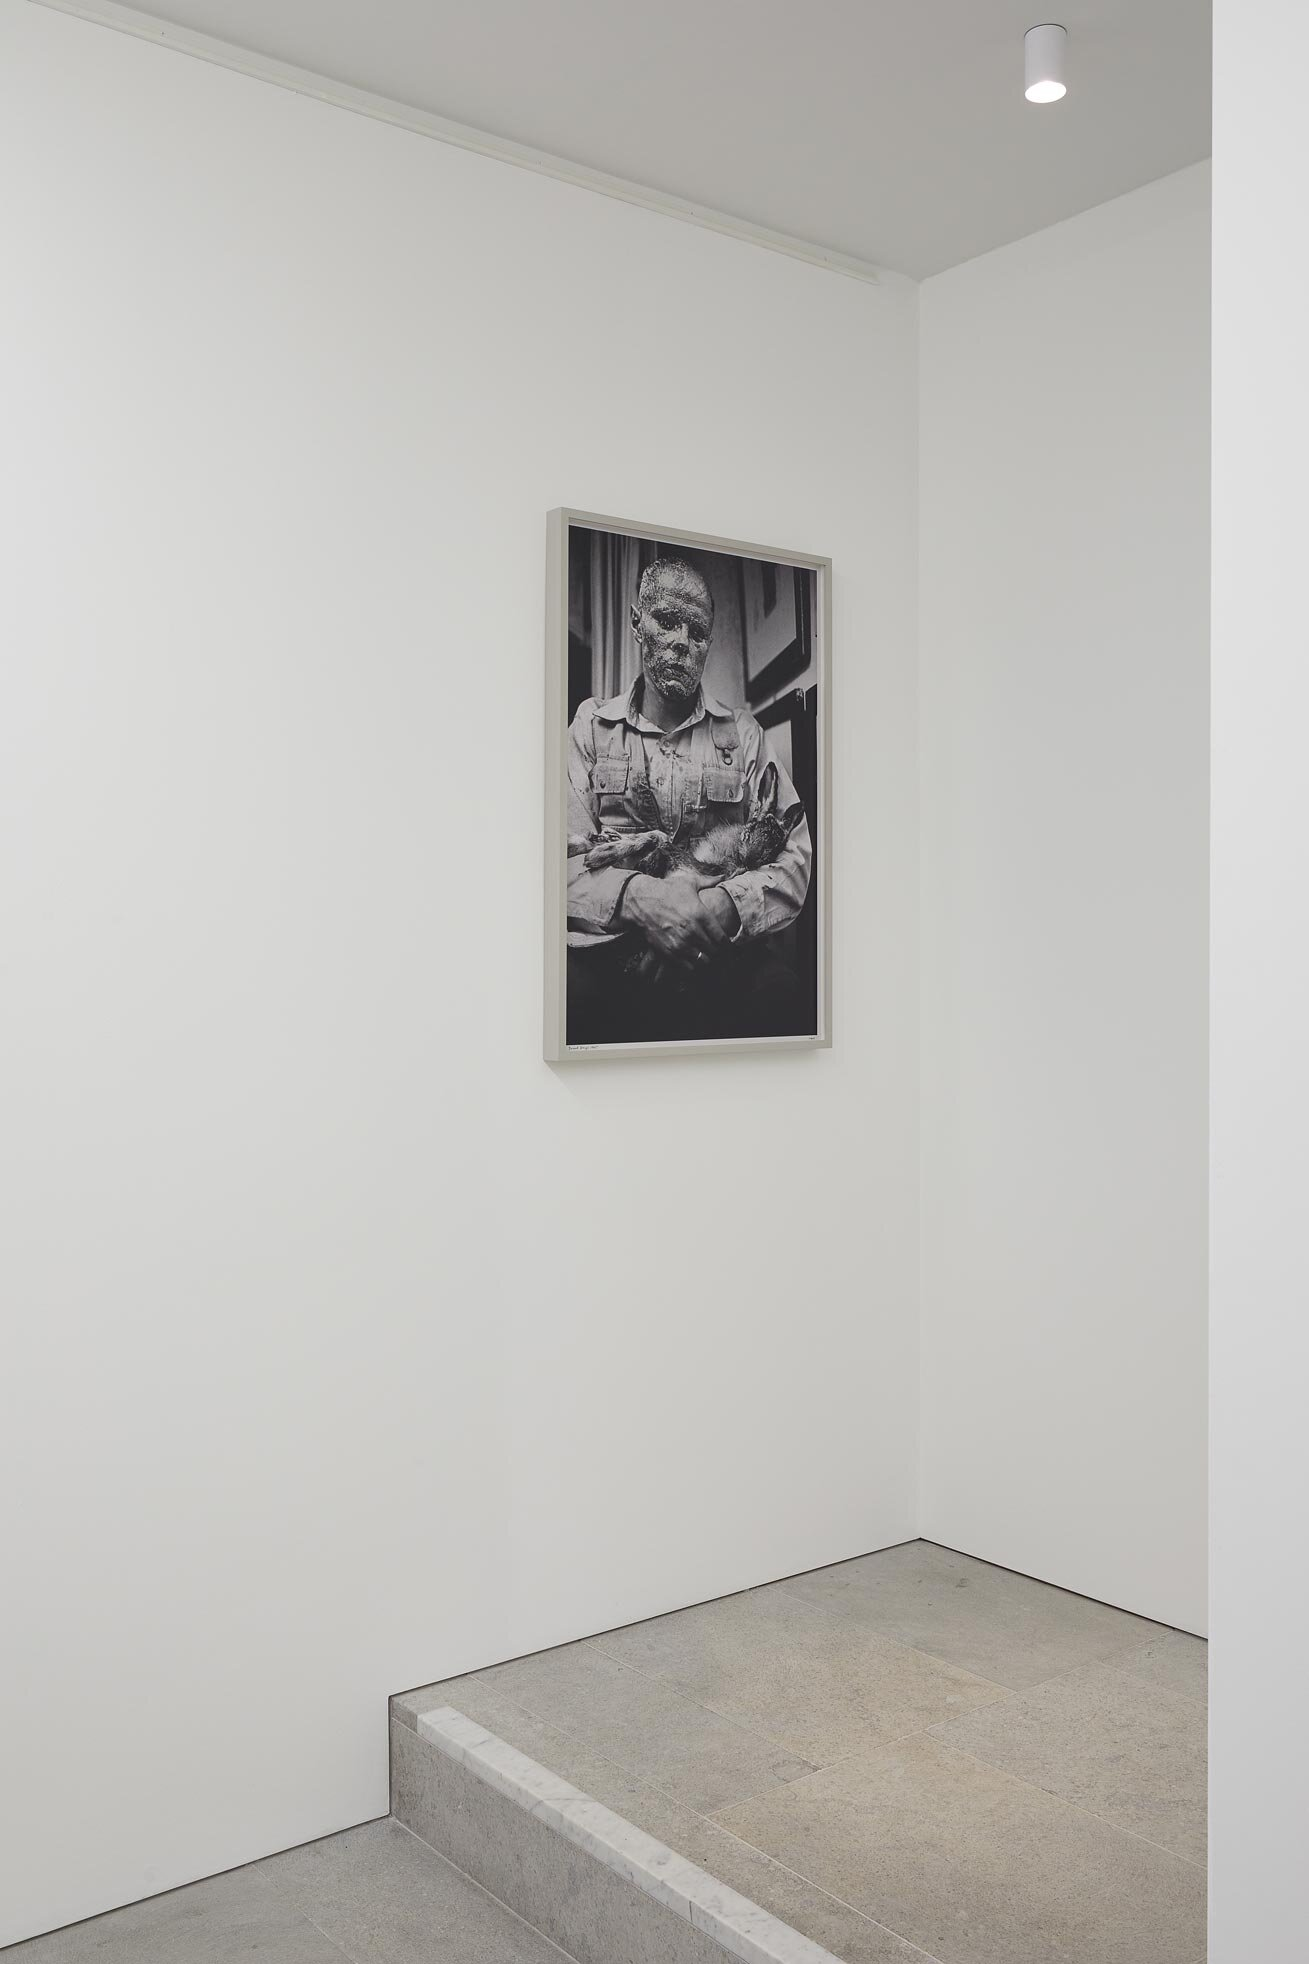 LE-MILE-Magazine-written-Tgen-Donovan-BASTIAN-Gallery-London-Installation-view-of-'Joseph-Beuys'-at-BASTIAN,-London,-20-September---16-November-2019-(8).jpg